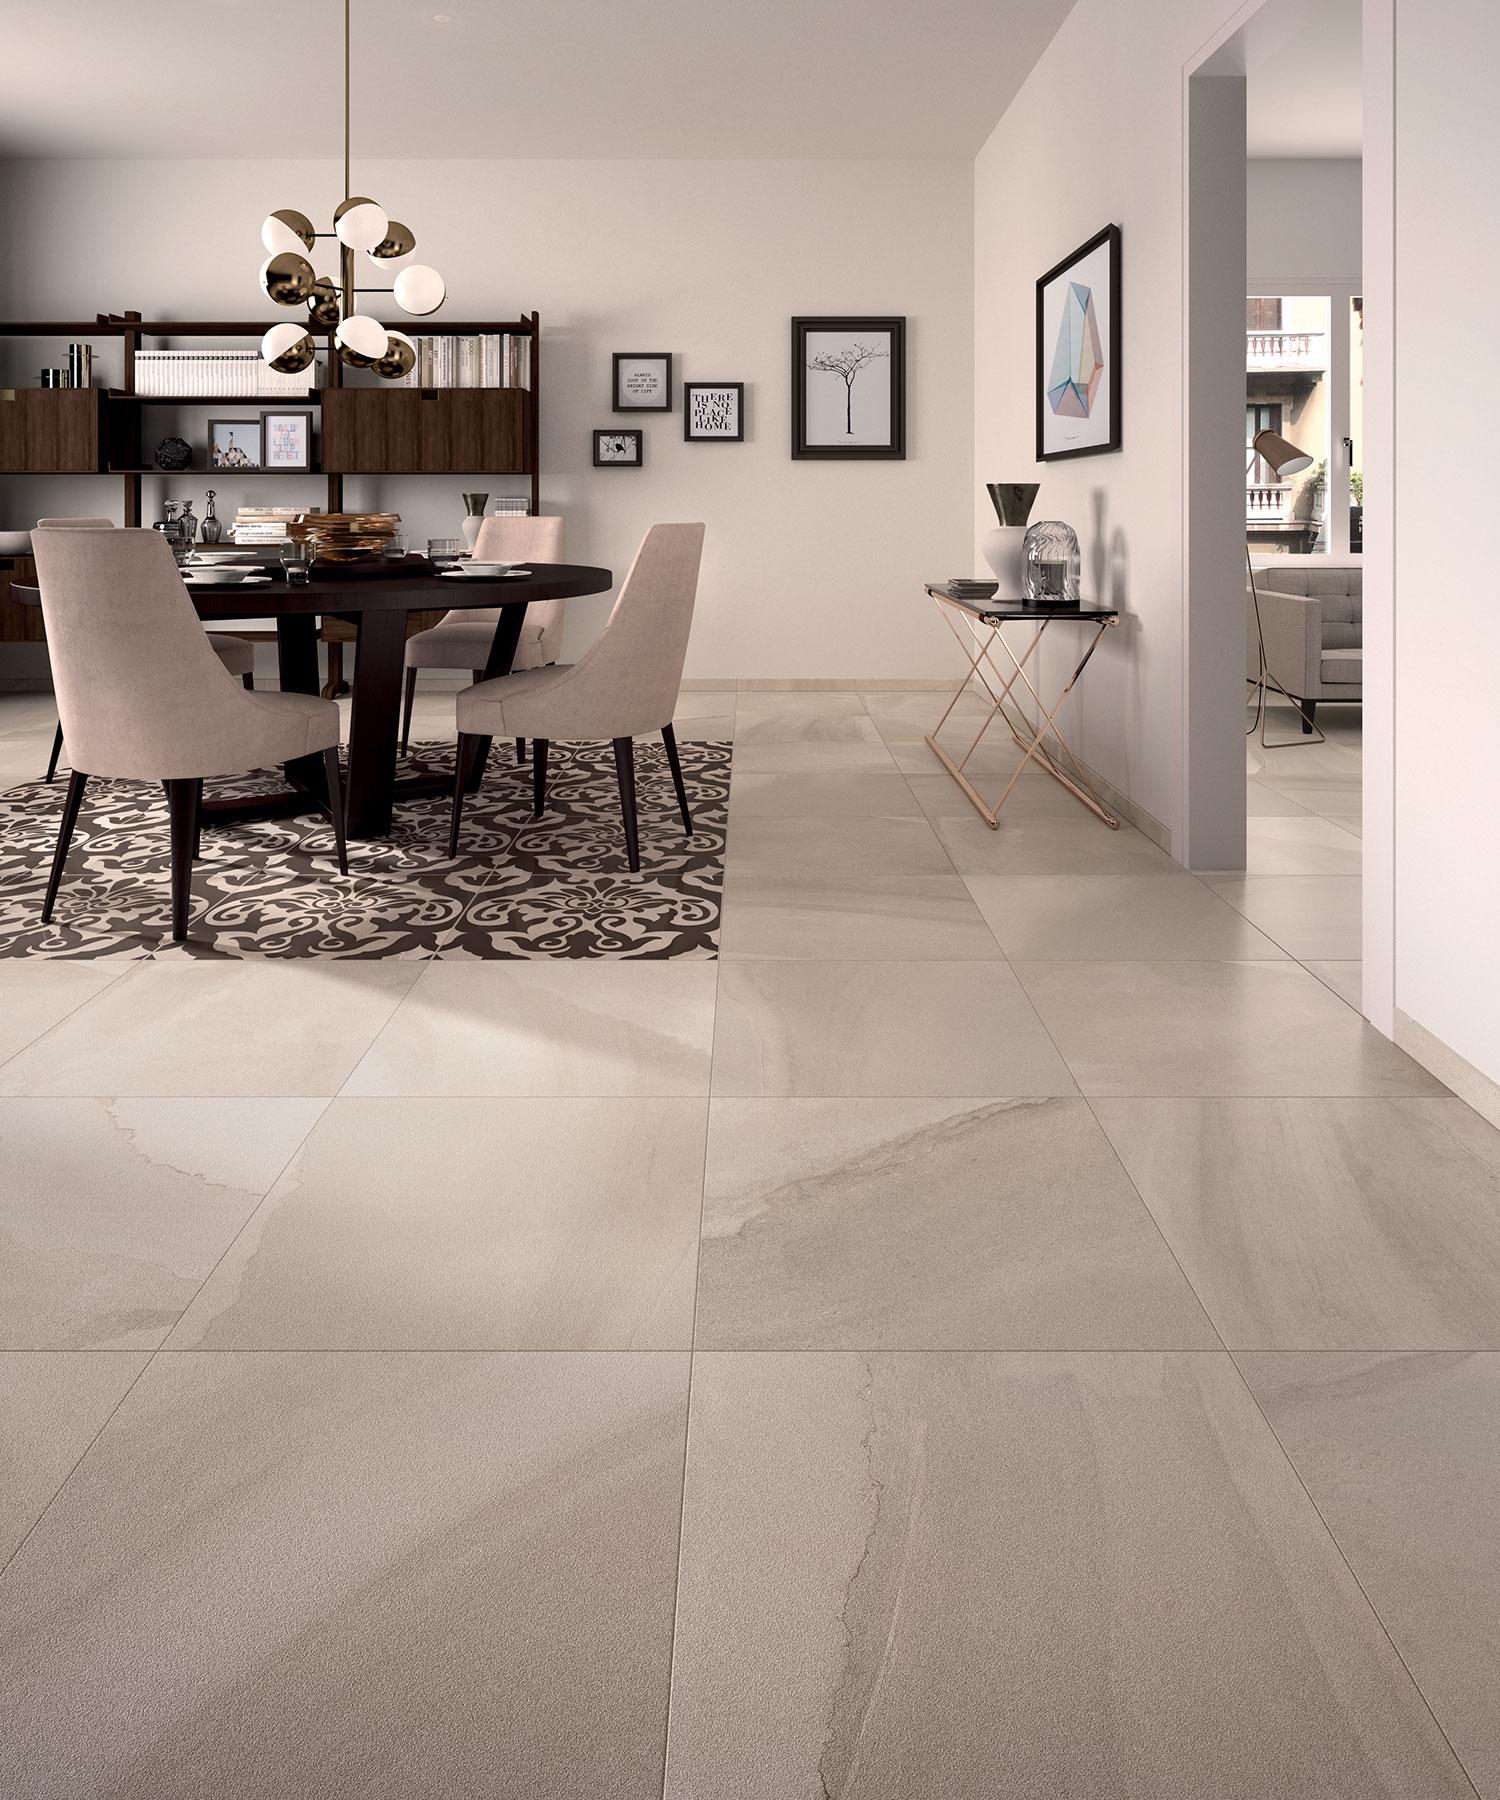 Only 25 M2 Fluido Sabbia Lappato Porcelain Italian Floor Tile